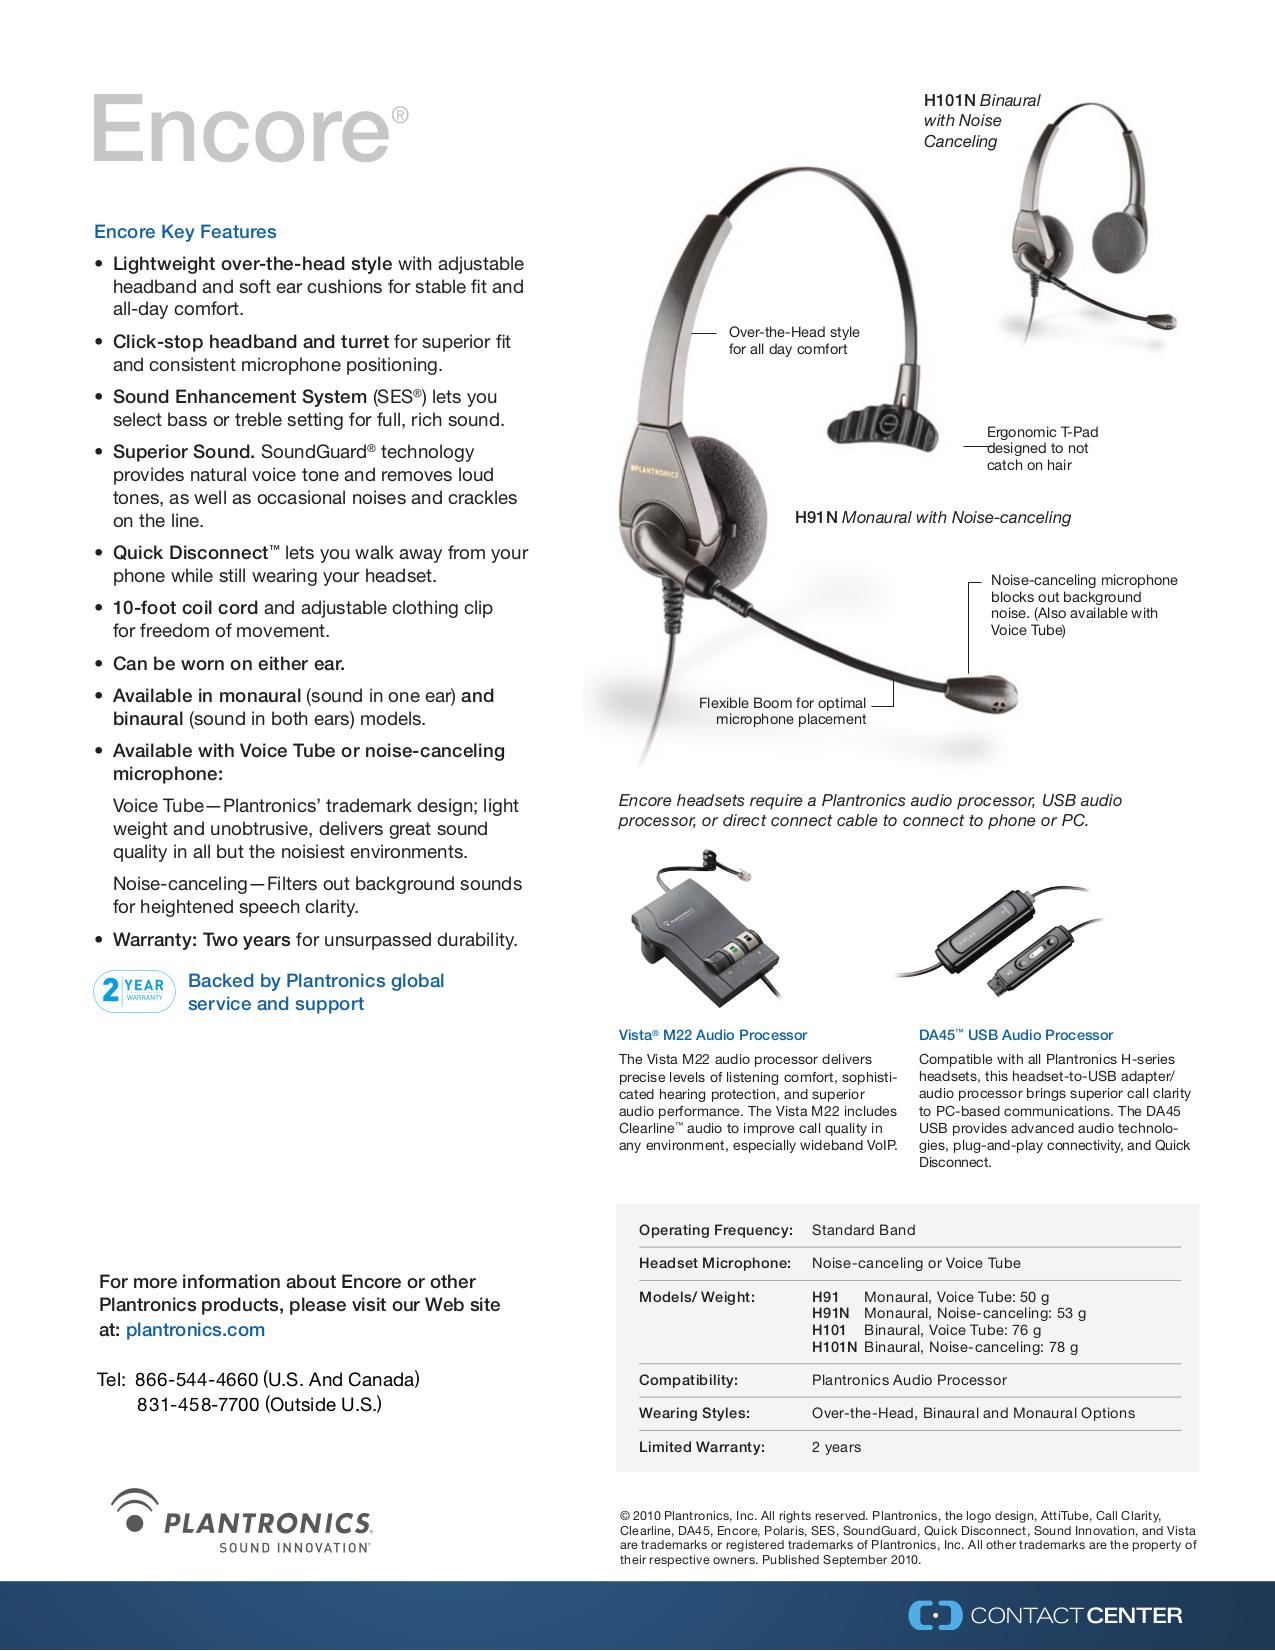 Download Free Pdf For Plantronics Encore H101n Headset Manual